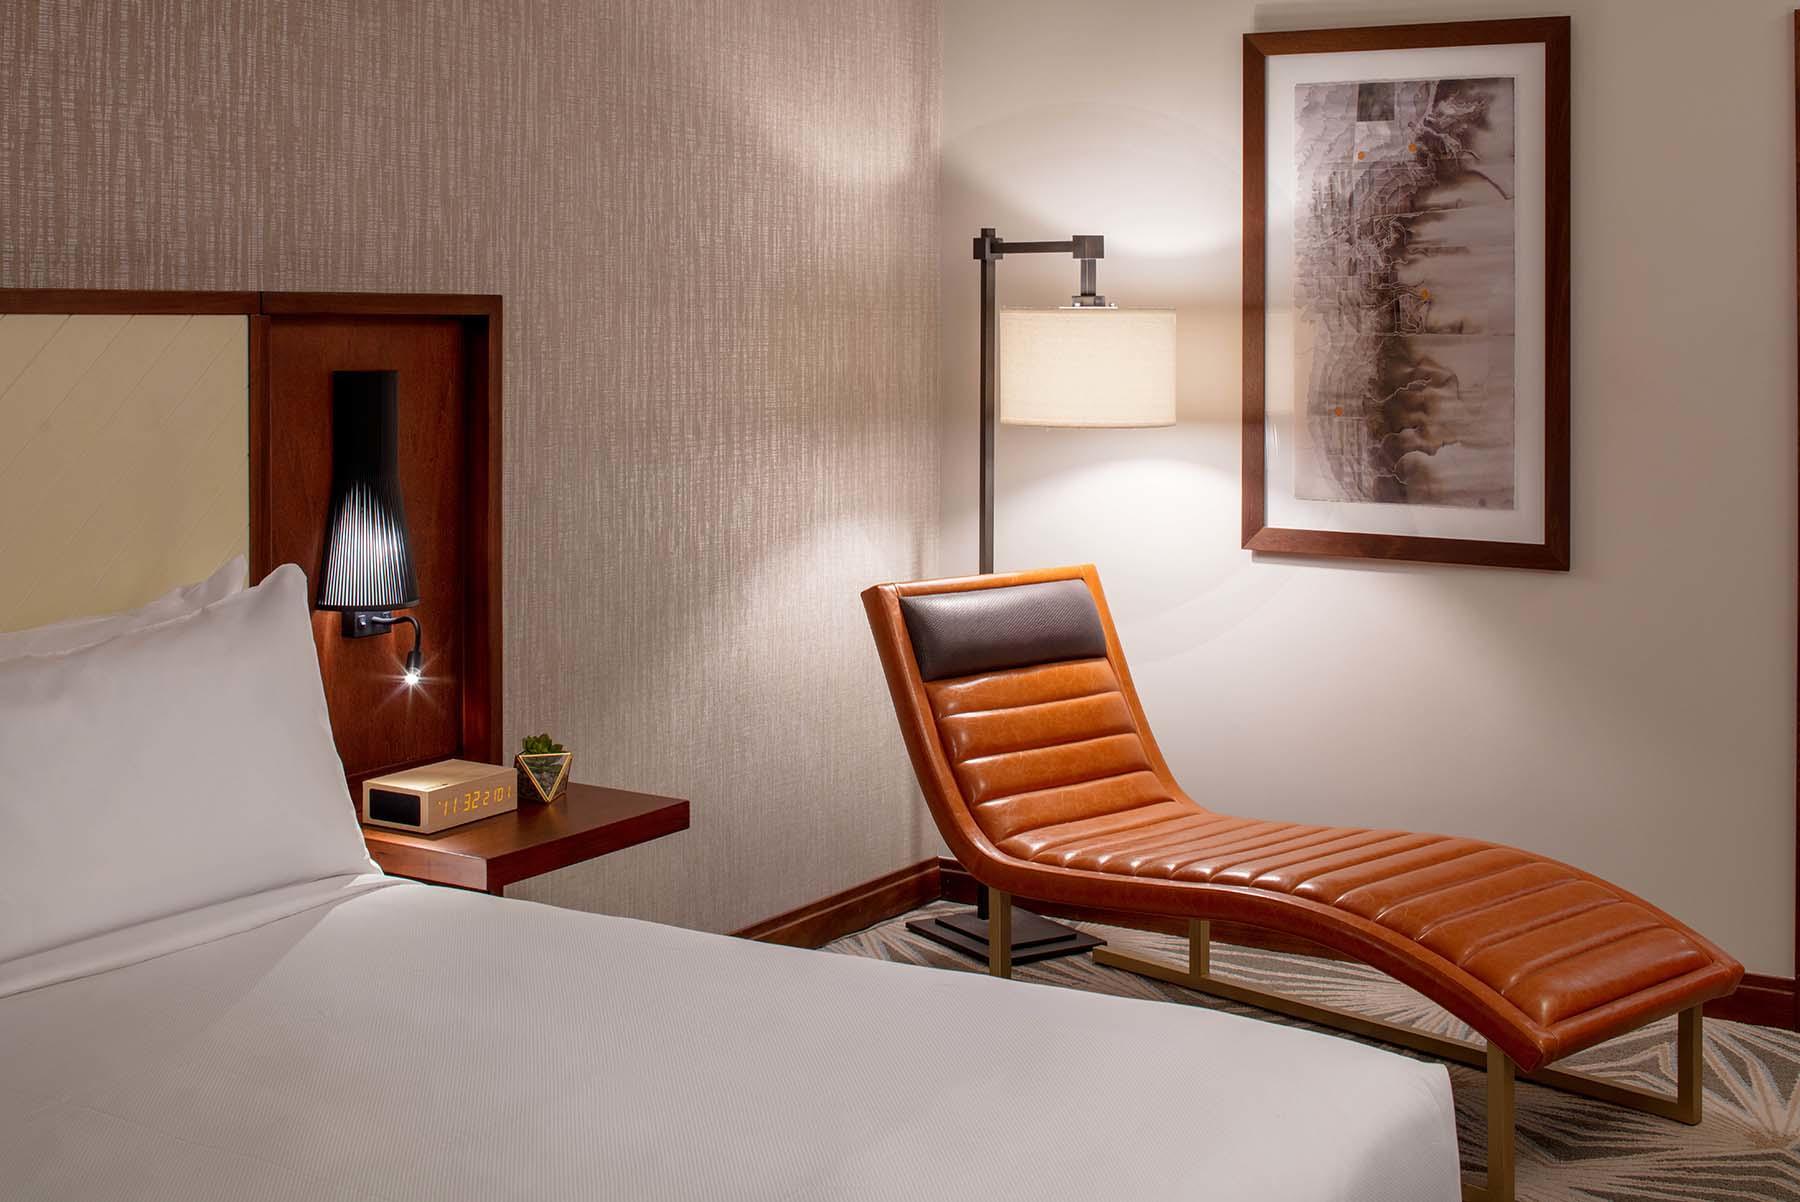 Hotel Adeline image 20